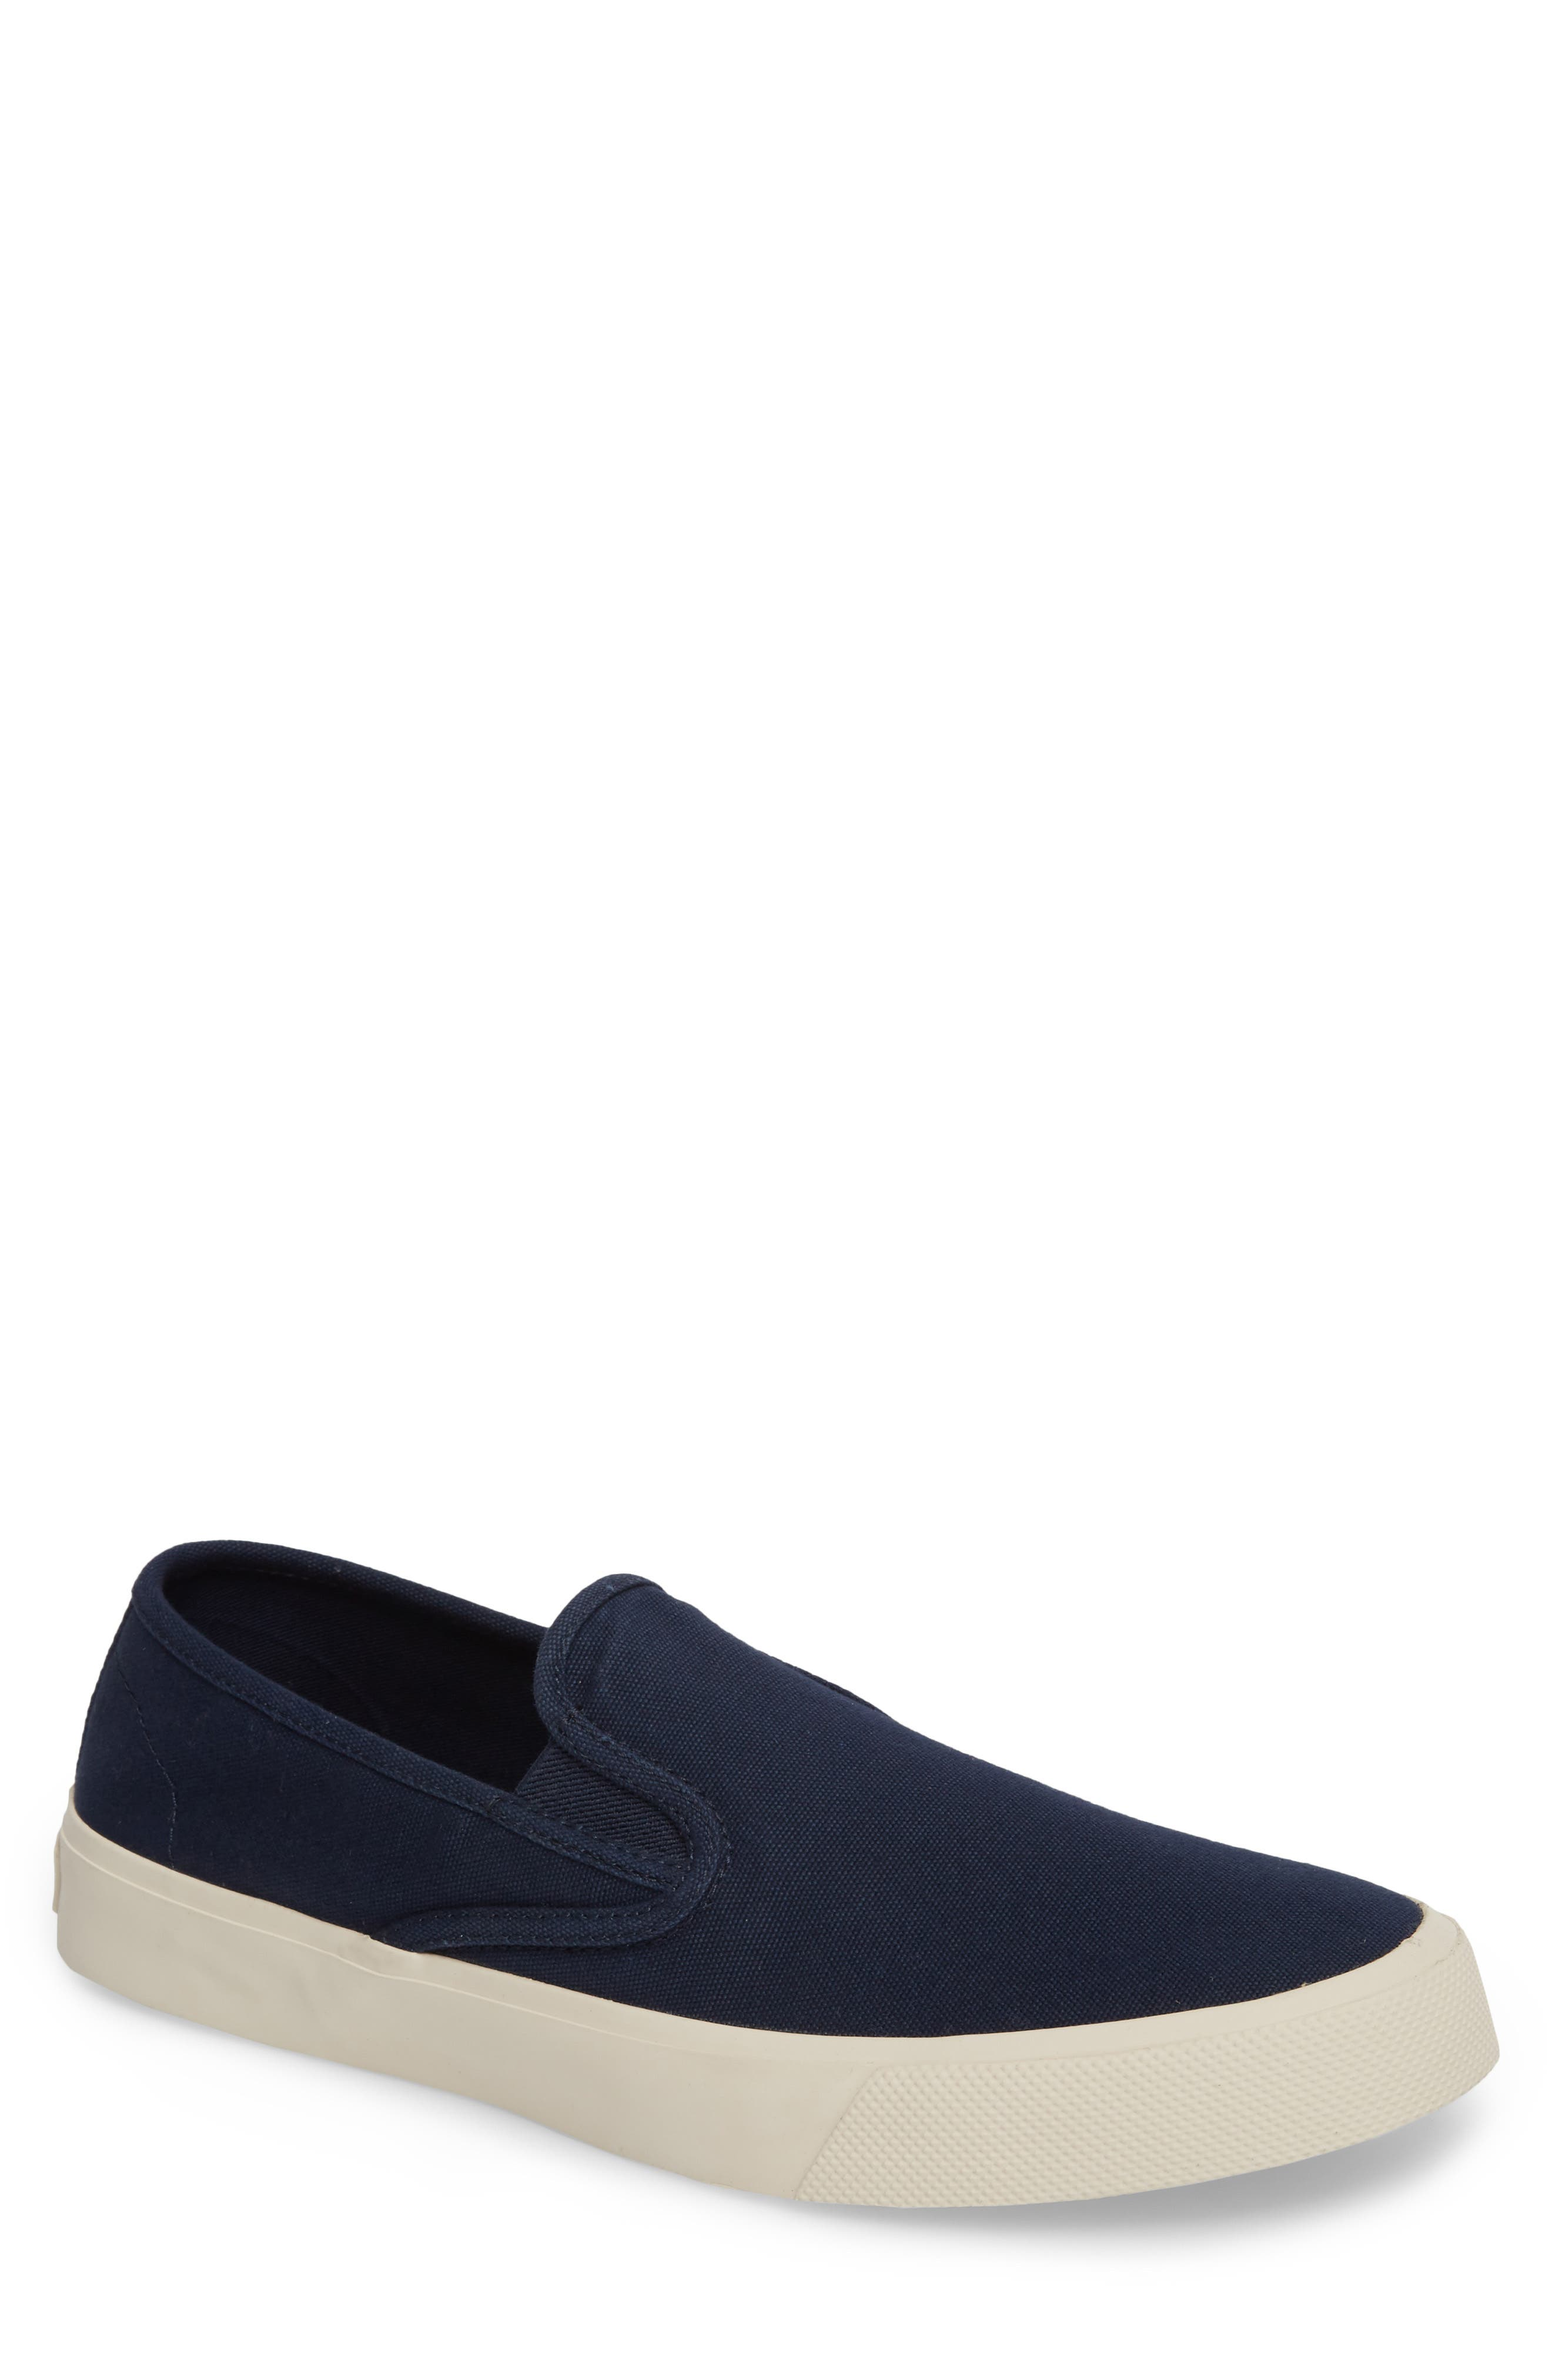 Striper II Slip-On Sneaker,                         Main,                         color, Navy